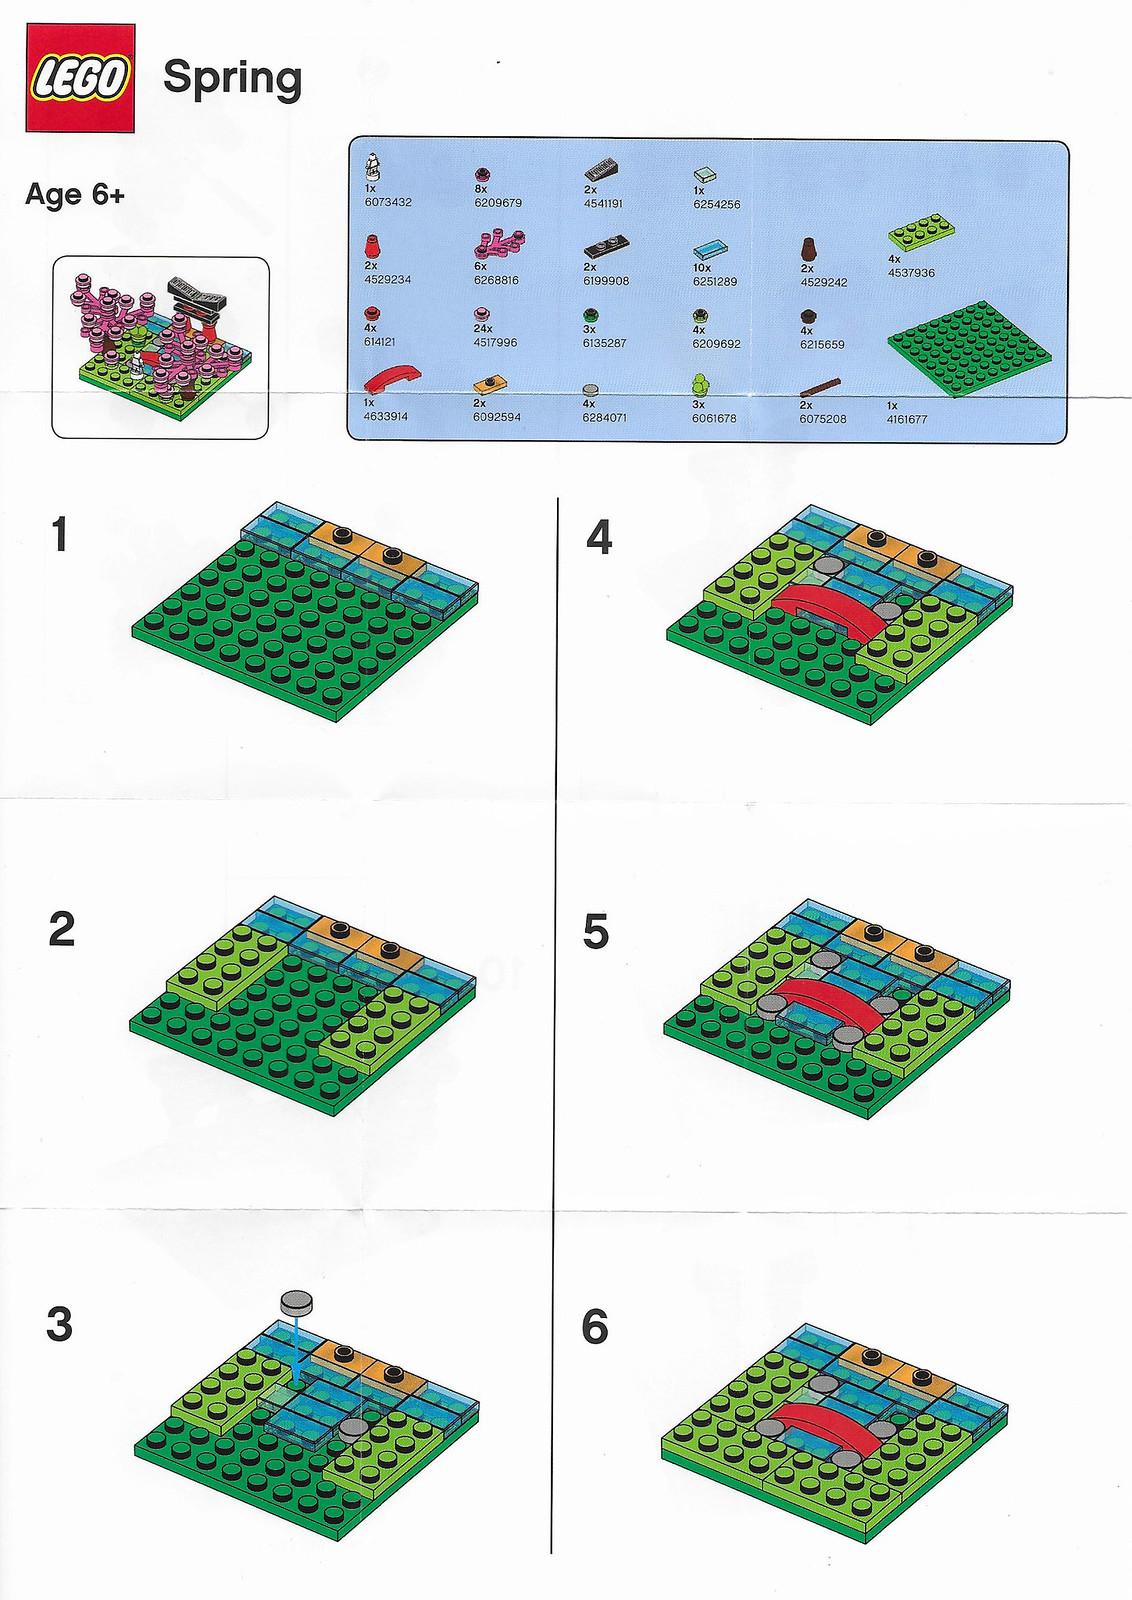 Toys 'R' Us LEGO Bricktober 2019 - Spring